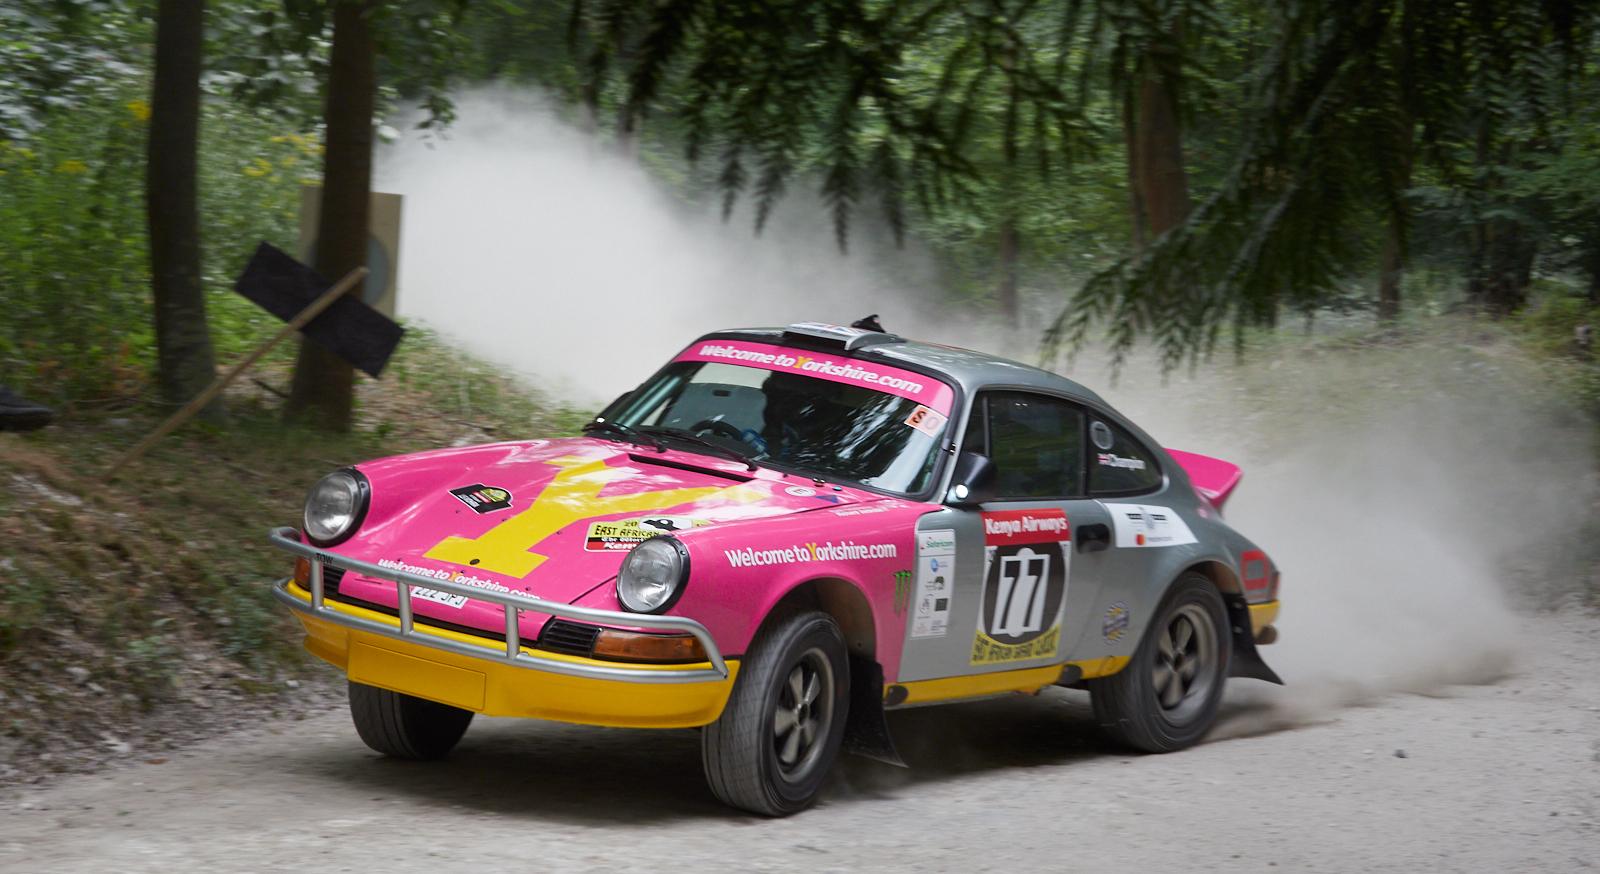 911 dust 1600x1200 sRGB.jpg